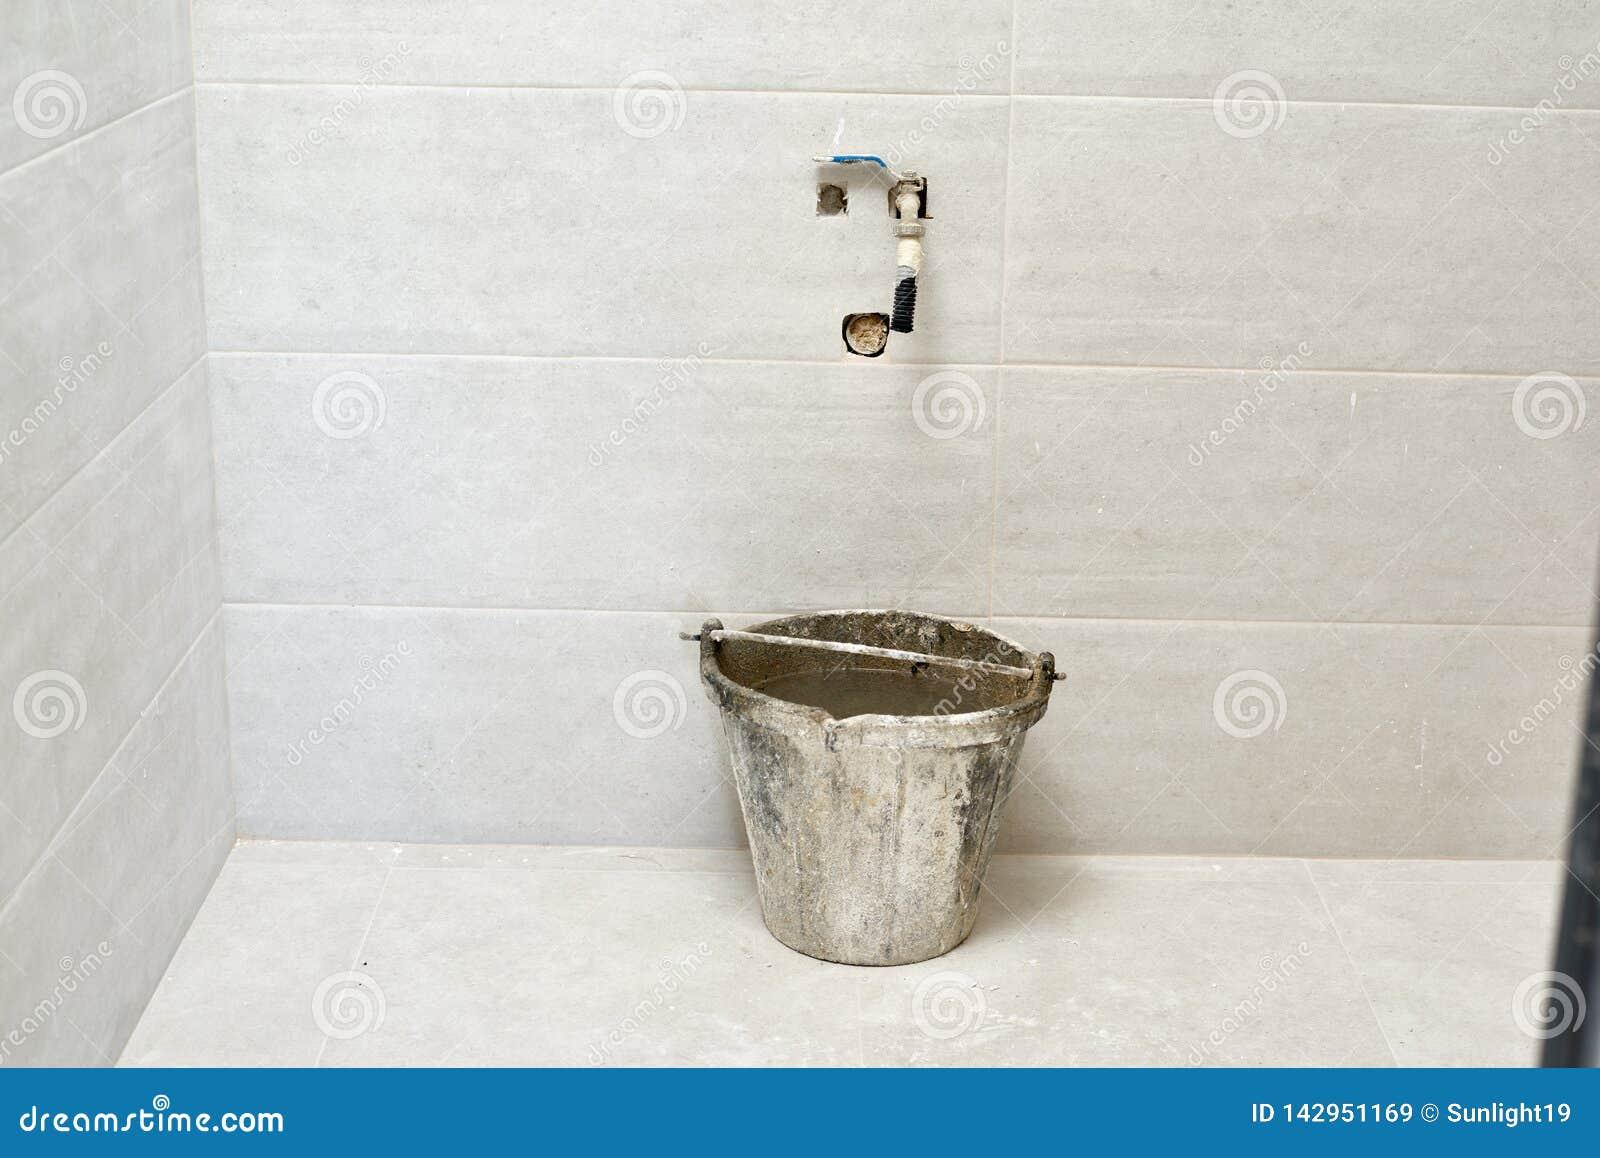 DIY, Ceramic Brick Tile Wall In A Bathroom Improvements ...